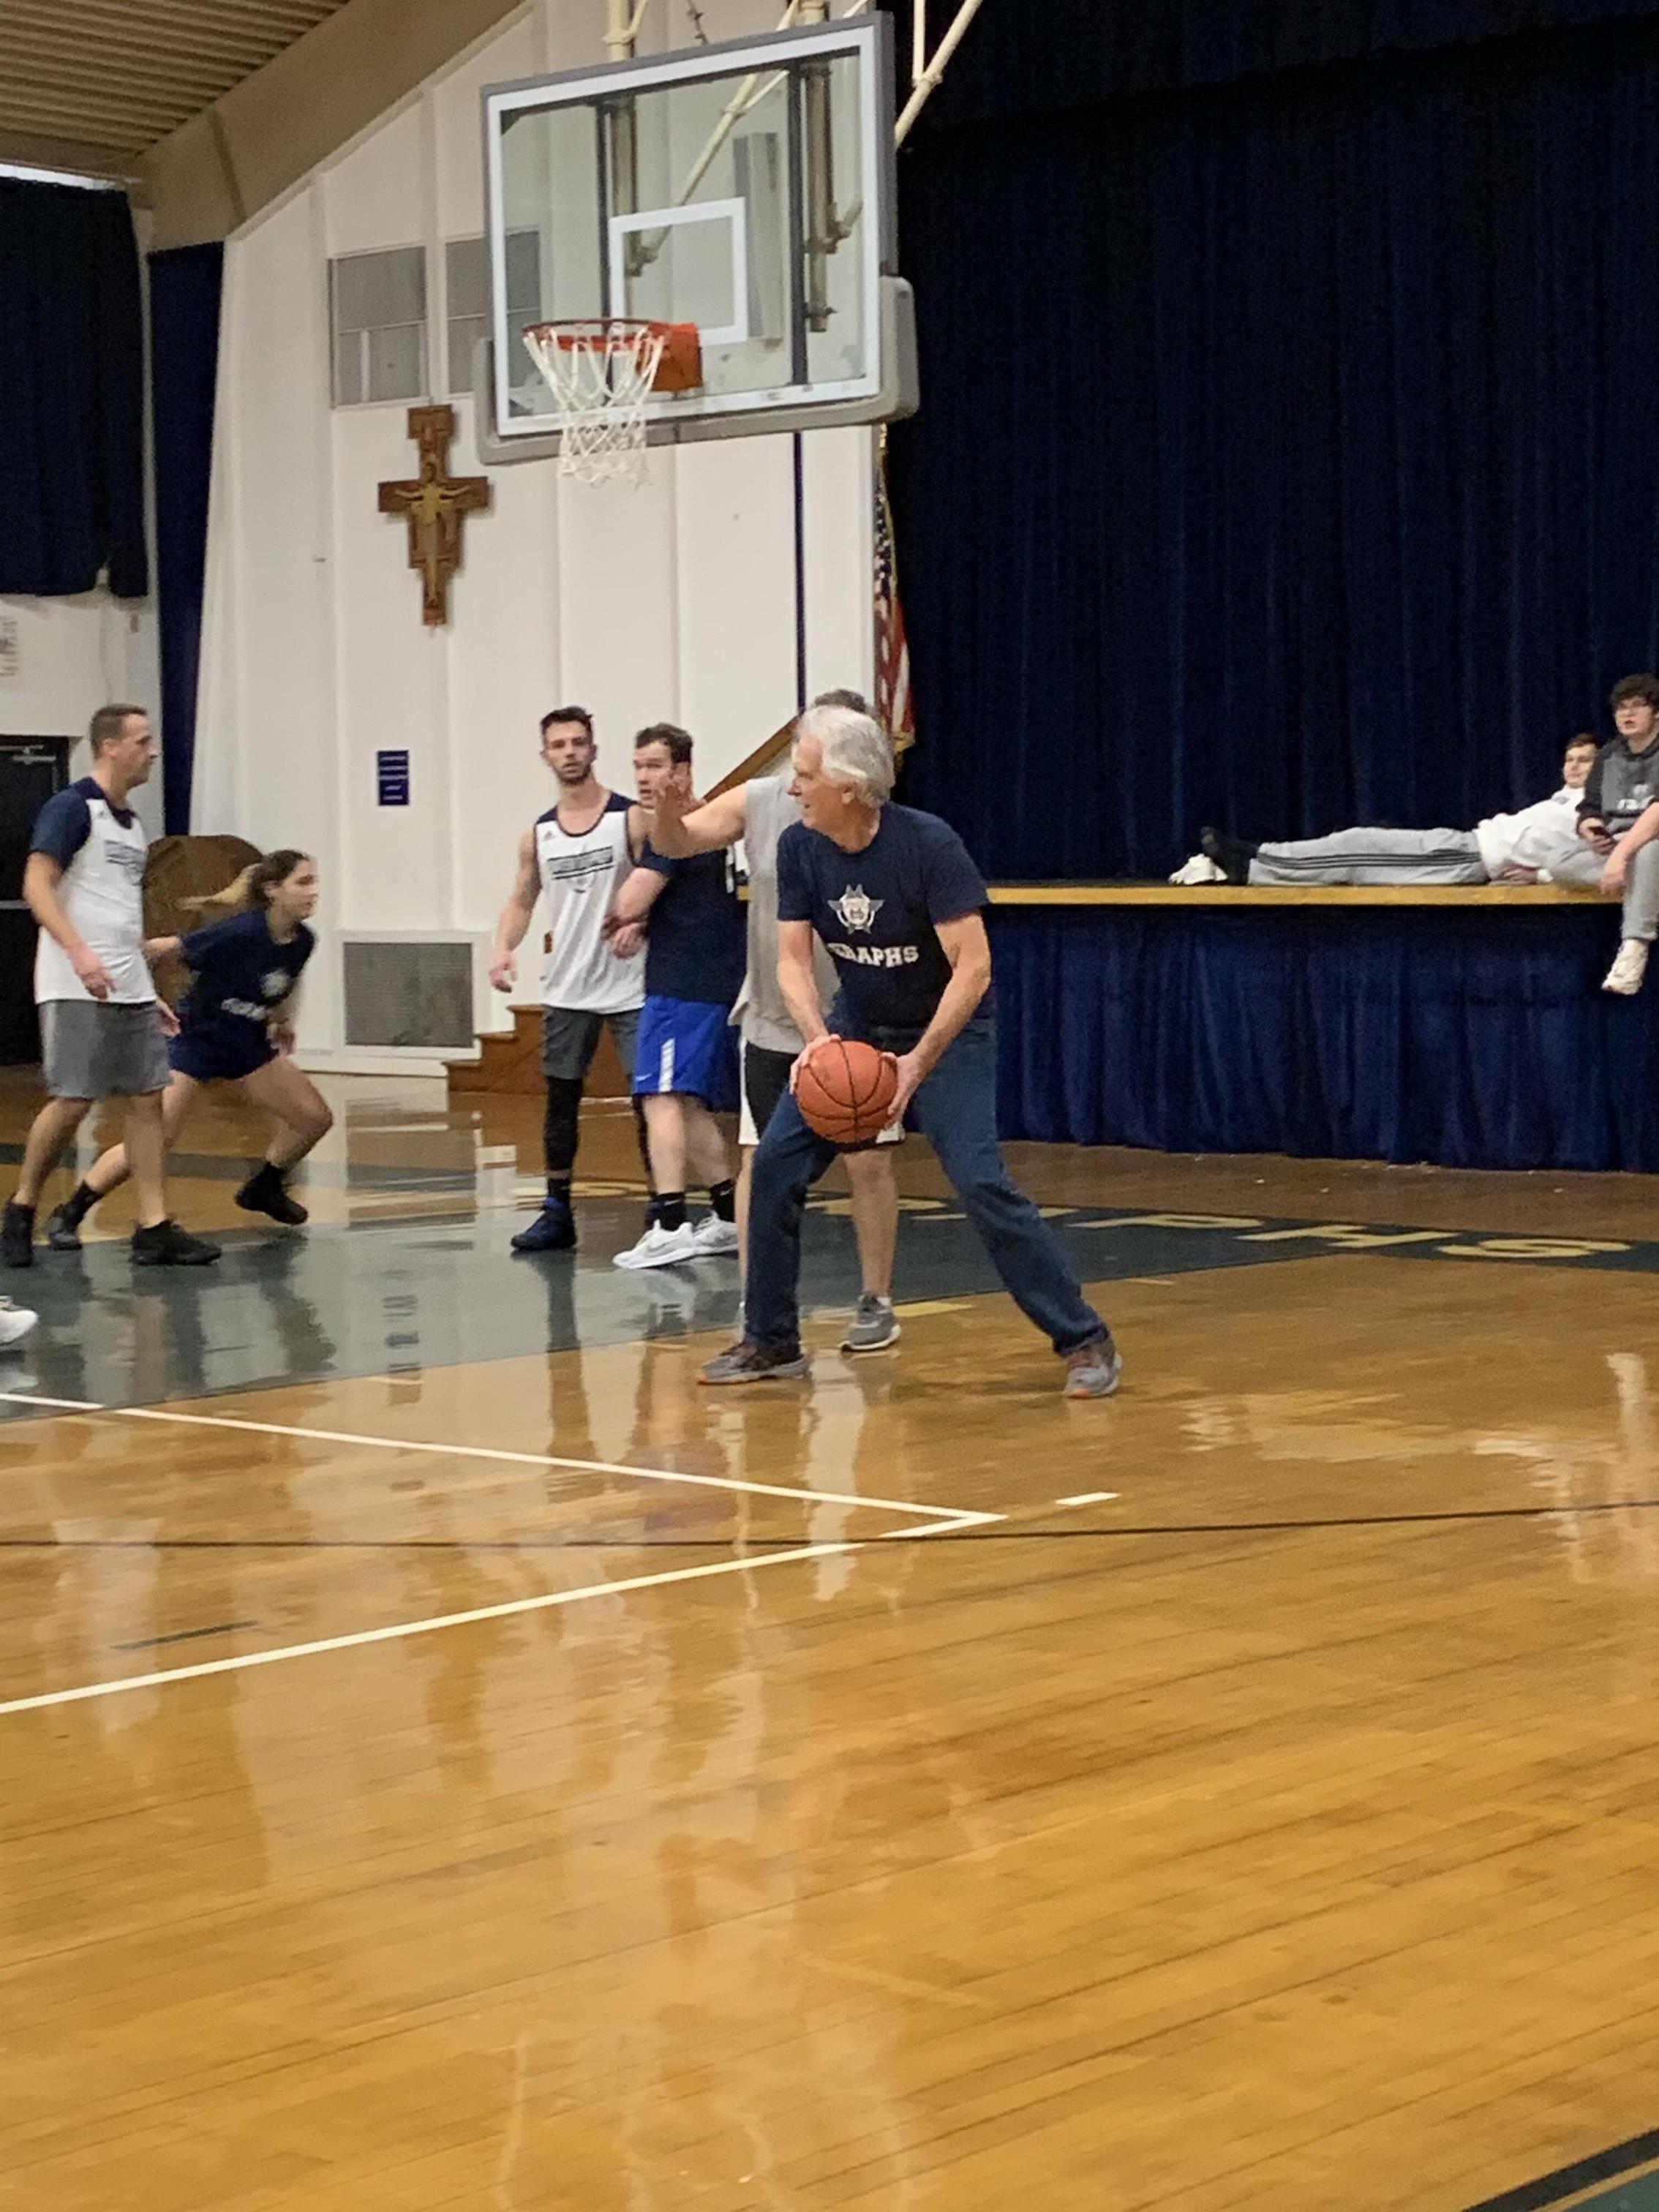 alumnibasketball